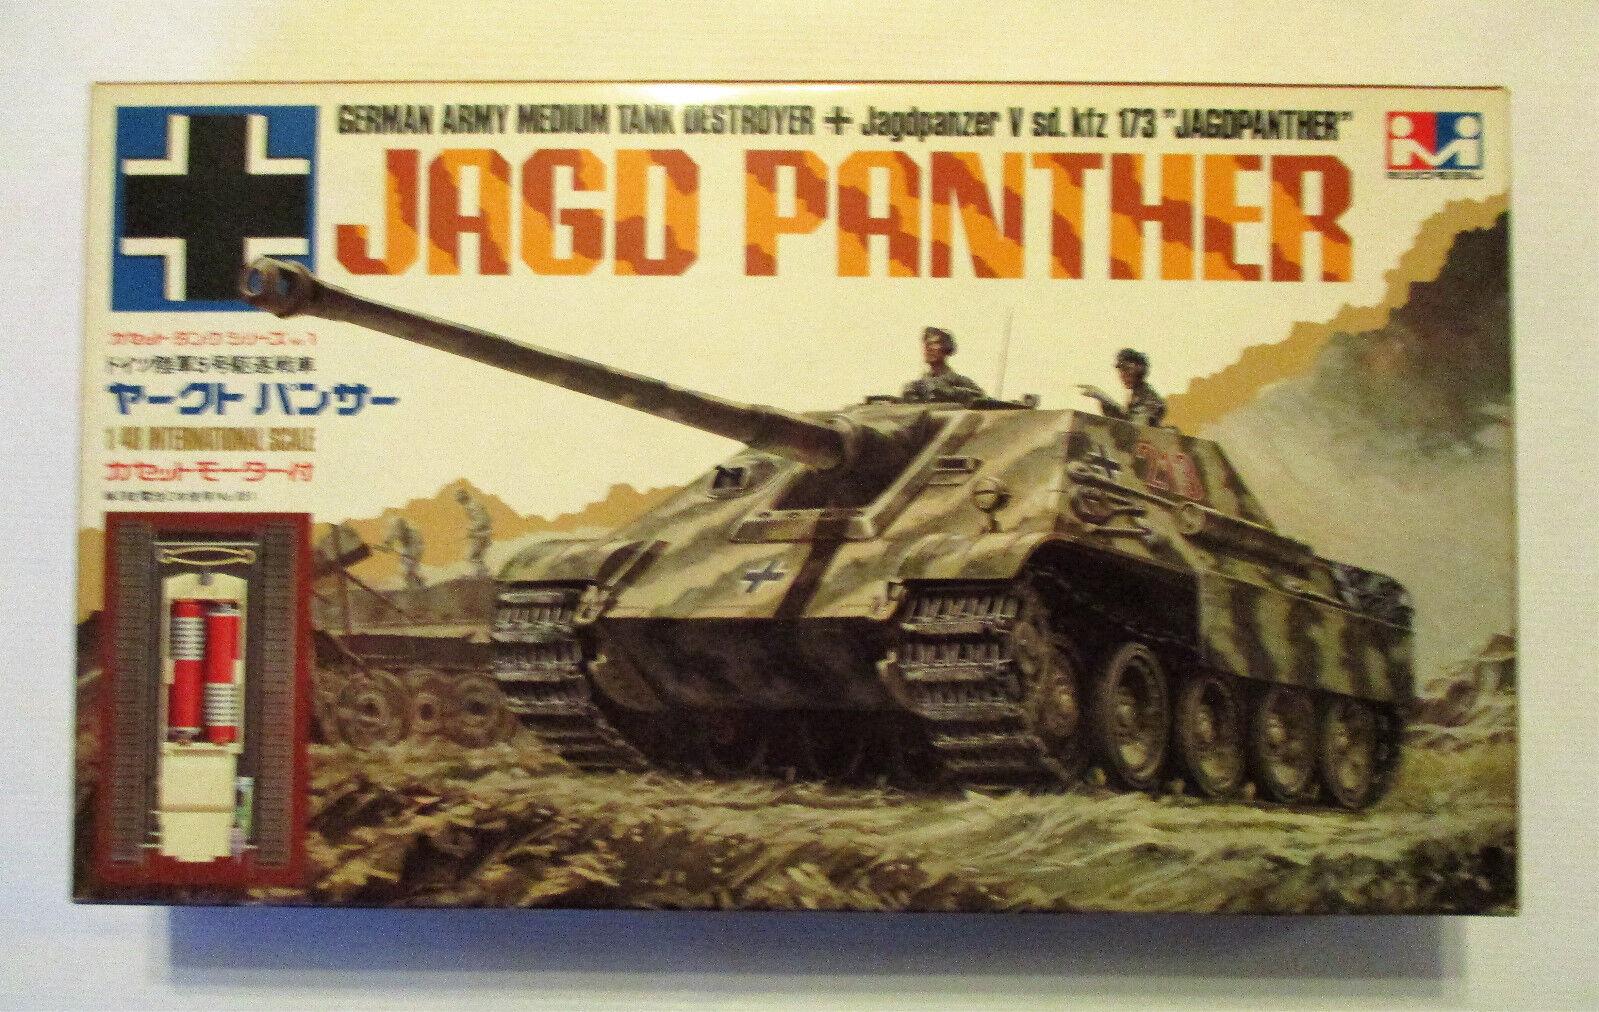 Vintage and rare 1 48 MITSUWA German WW2 Jagdpanther motorized model kit